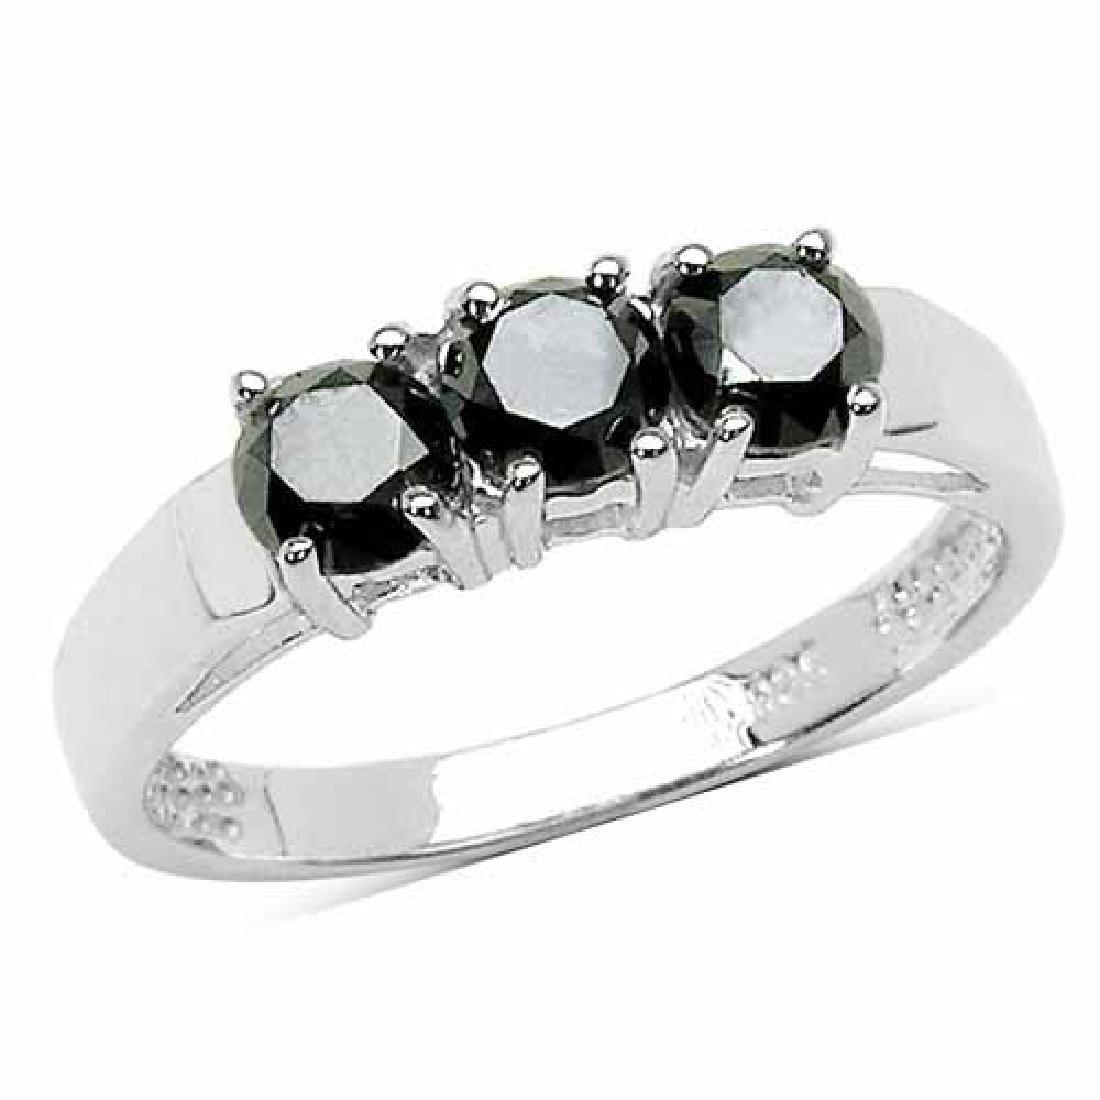 1.18 Carat Genuine Black Diamond .925 Sterling Silver R